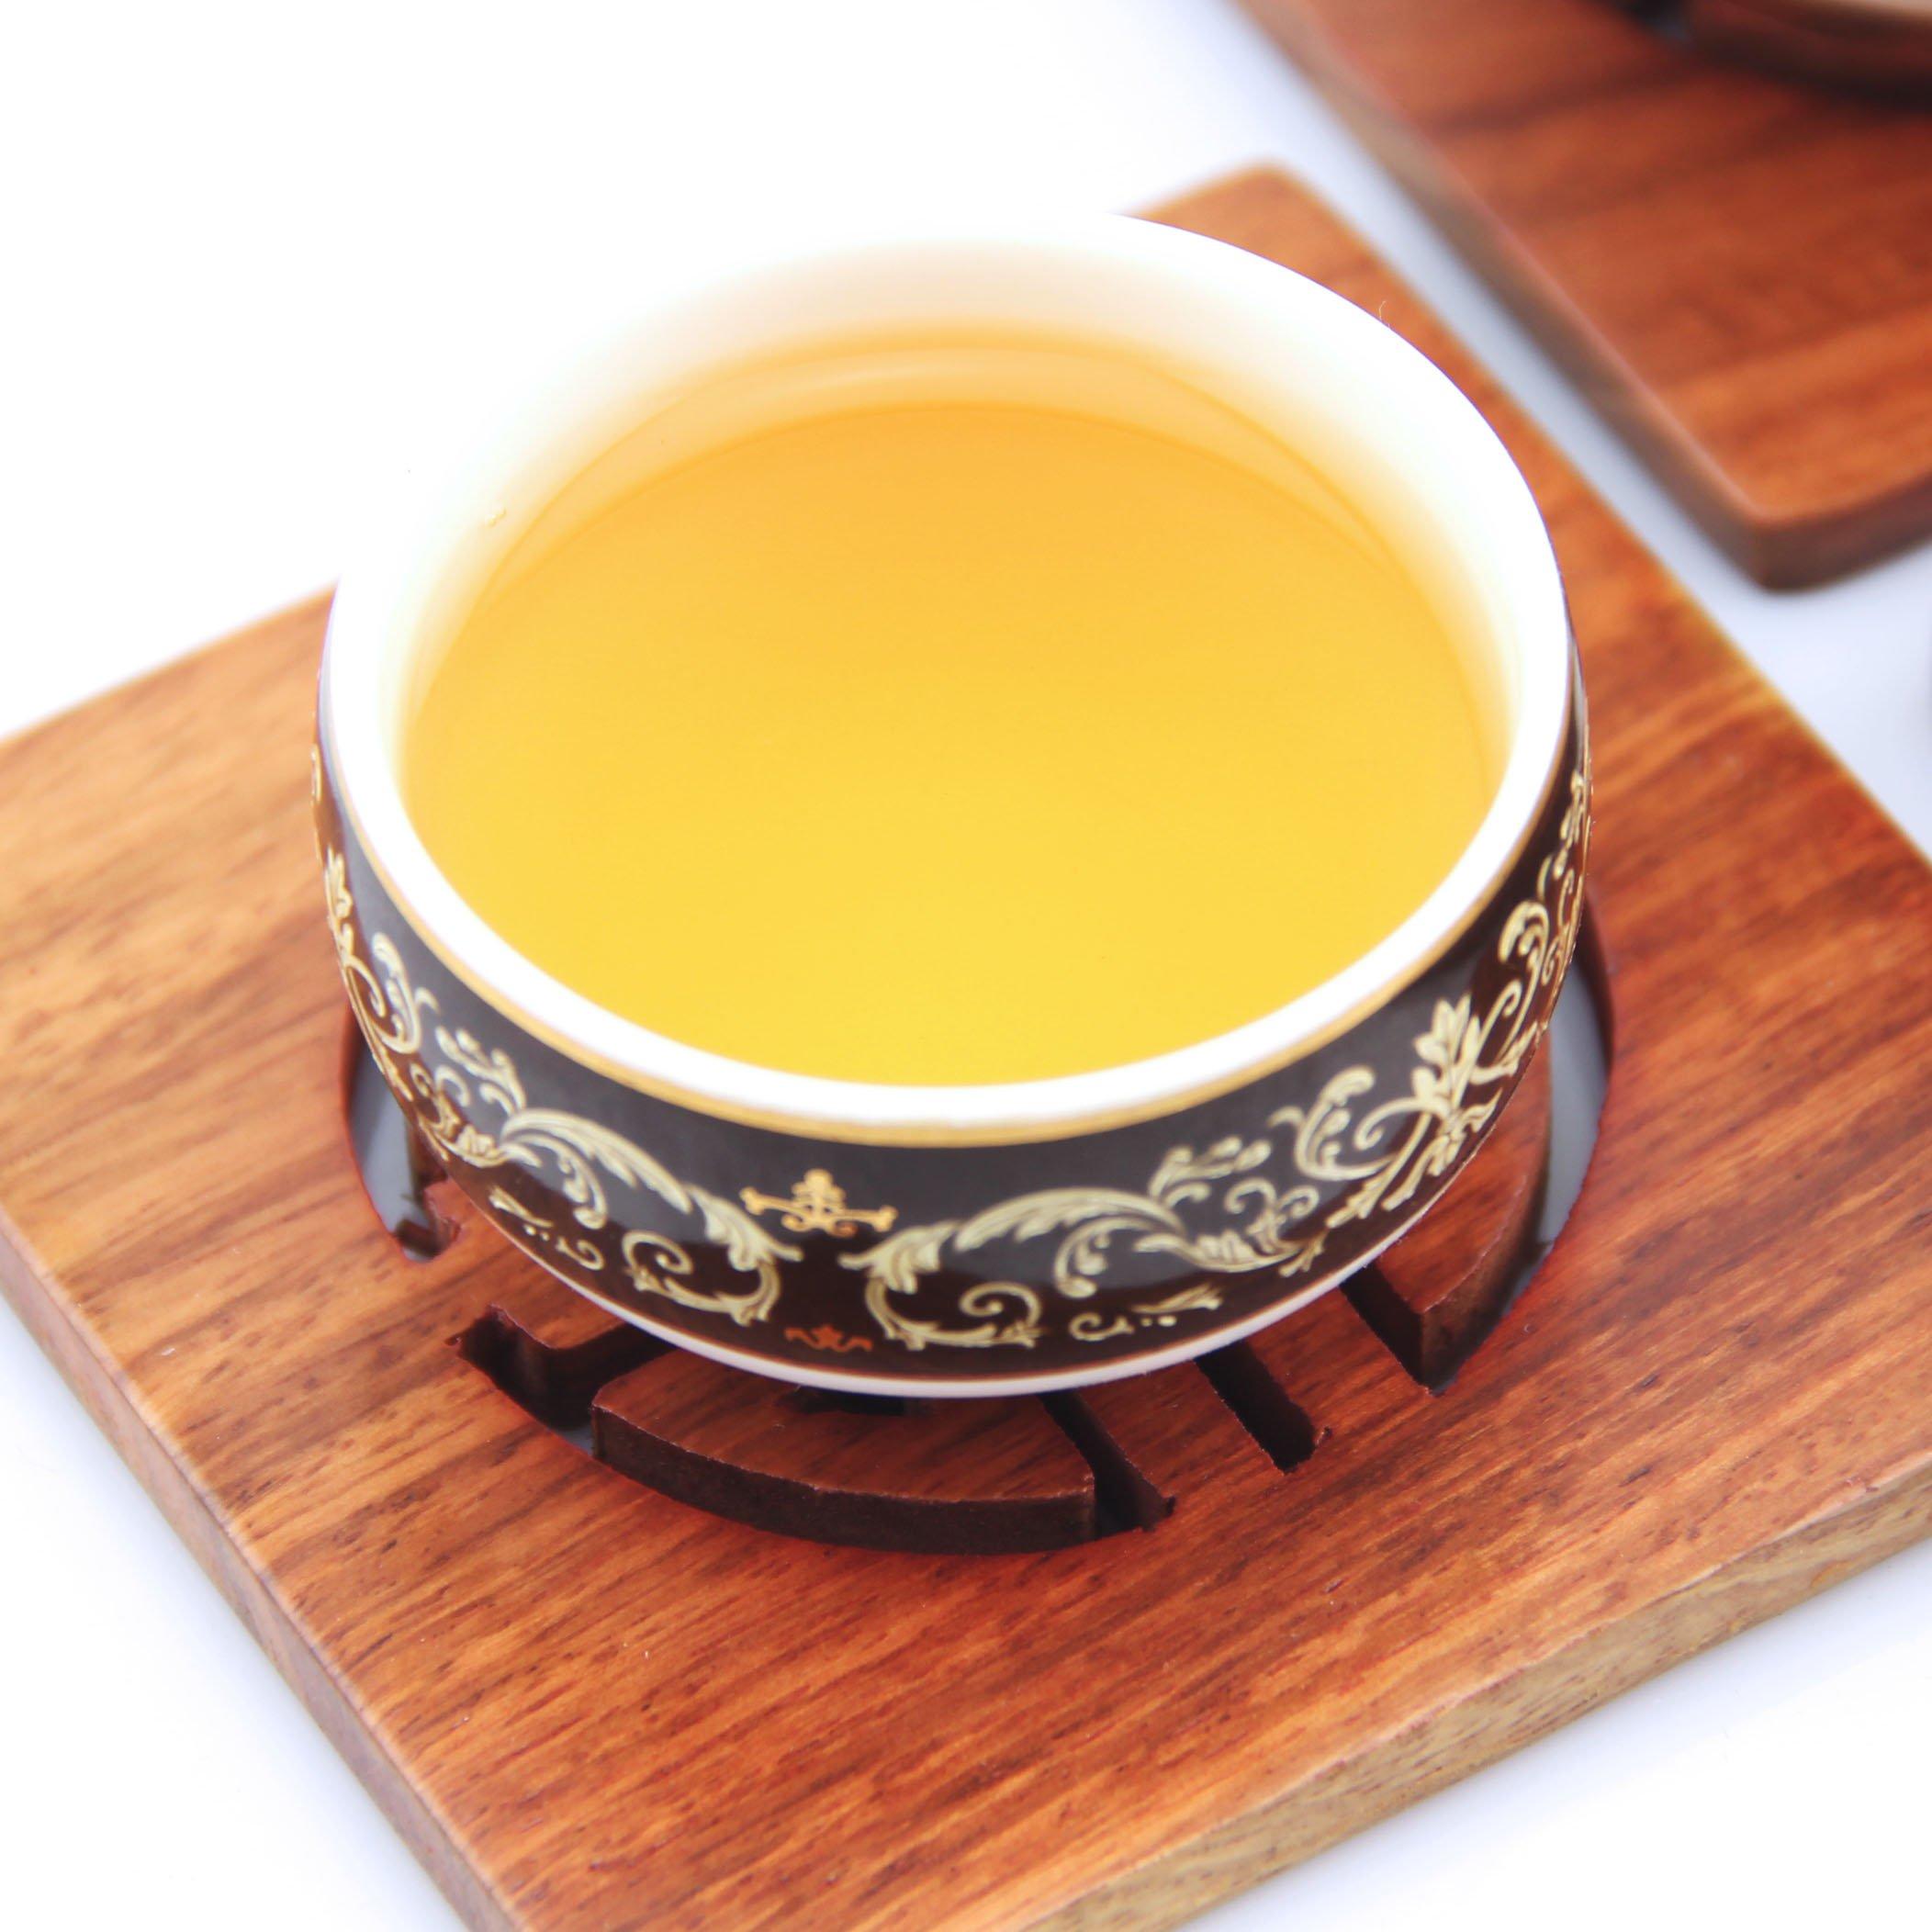 GOARTEA 300g (10.58 oz) 2014 Year Remote Mountain Wild FuDing Supreme Bai Mu Dan King White Peony Cake White Tea by GOARTEA (Image #4)